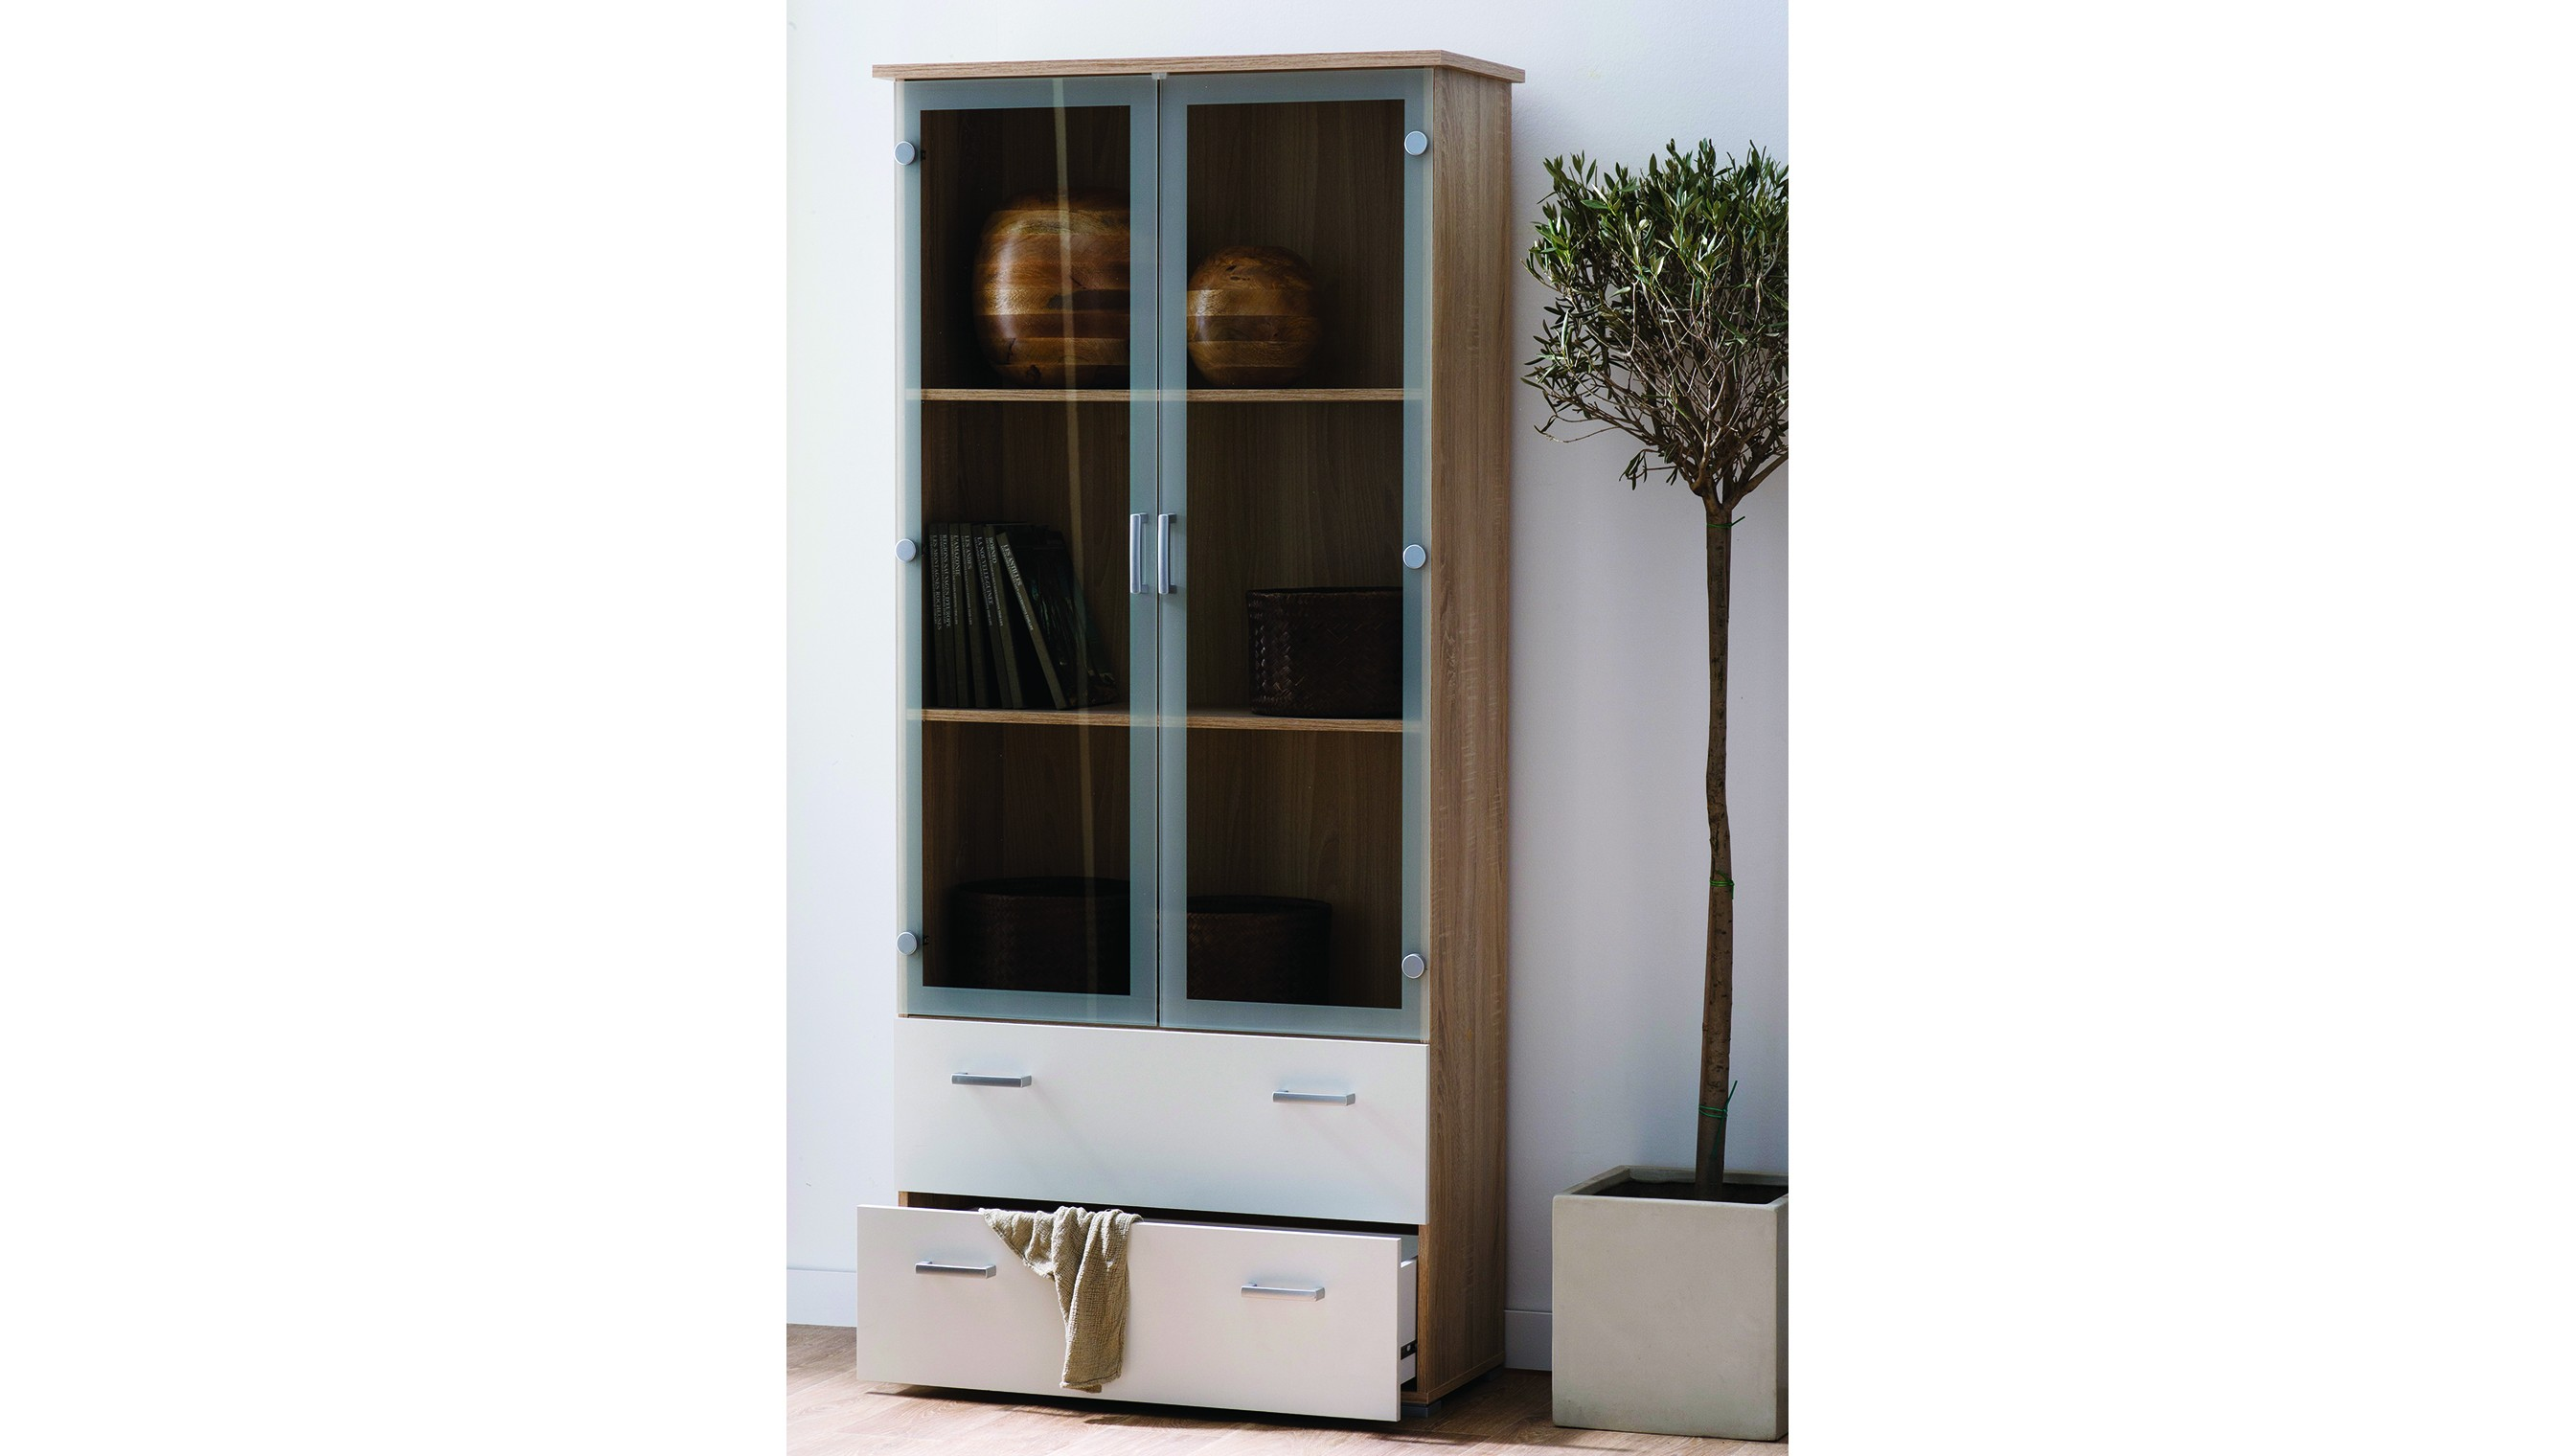 vitrinen deko best vitrine hellblau ideen bilder roomido modern dekoo with vitrinen deko. Black Bedroom Furniture Sets. Home Design Ideas